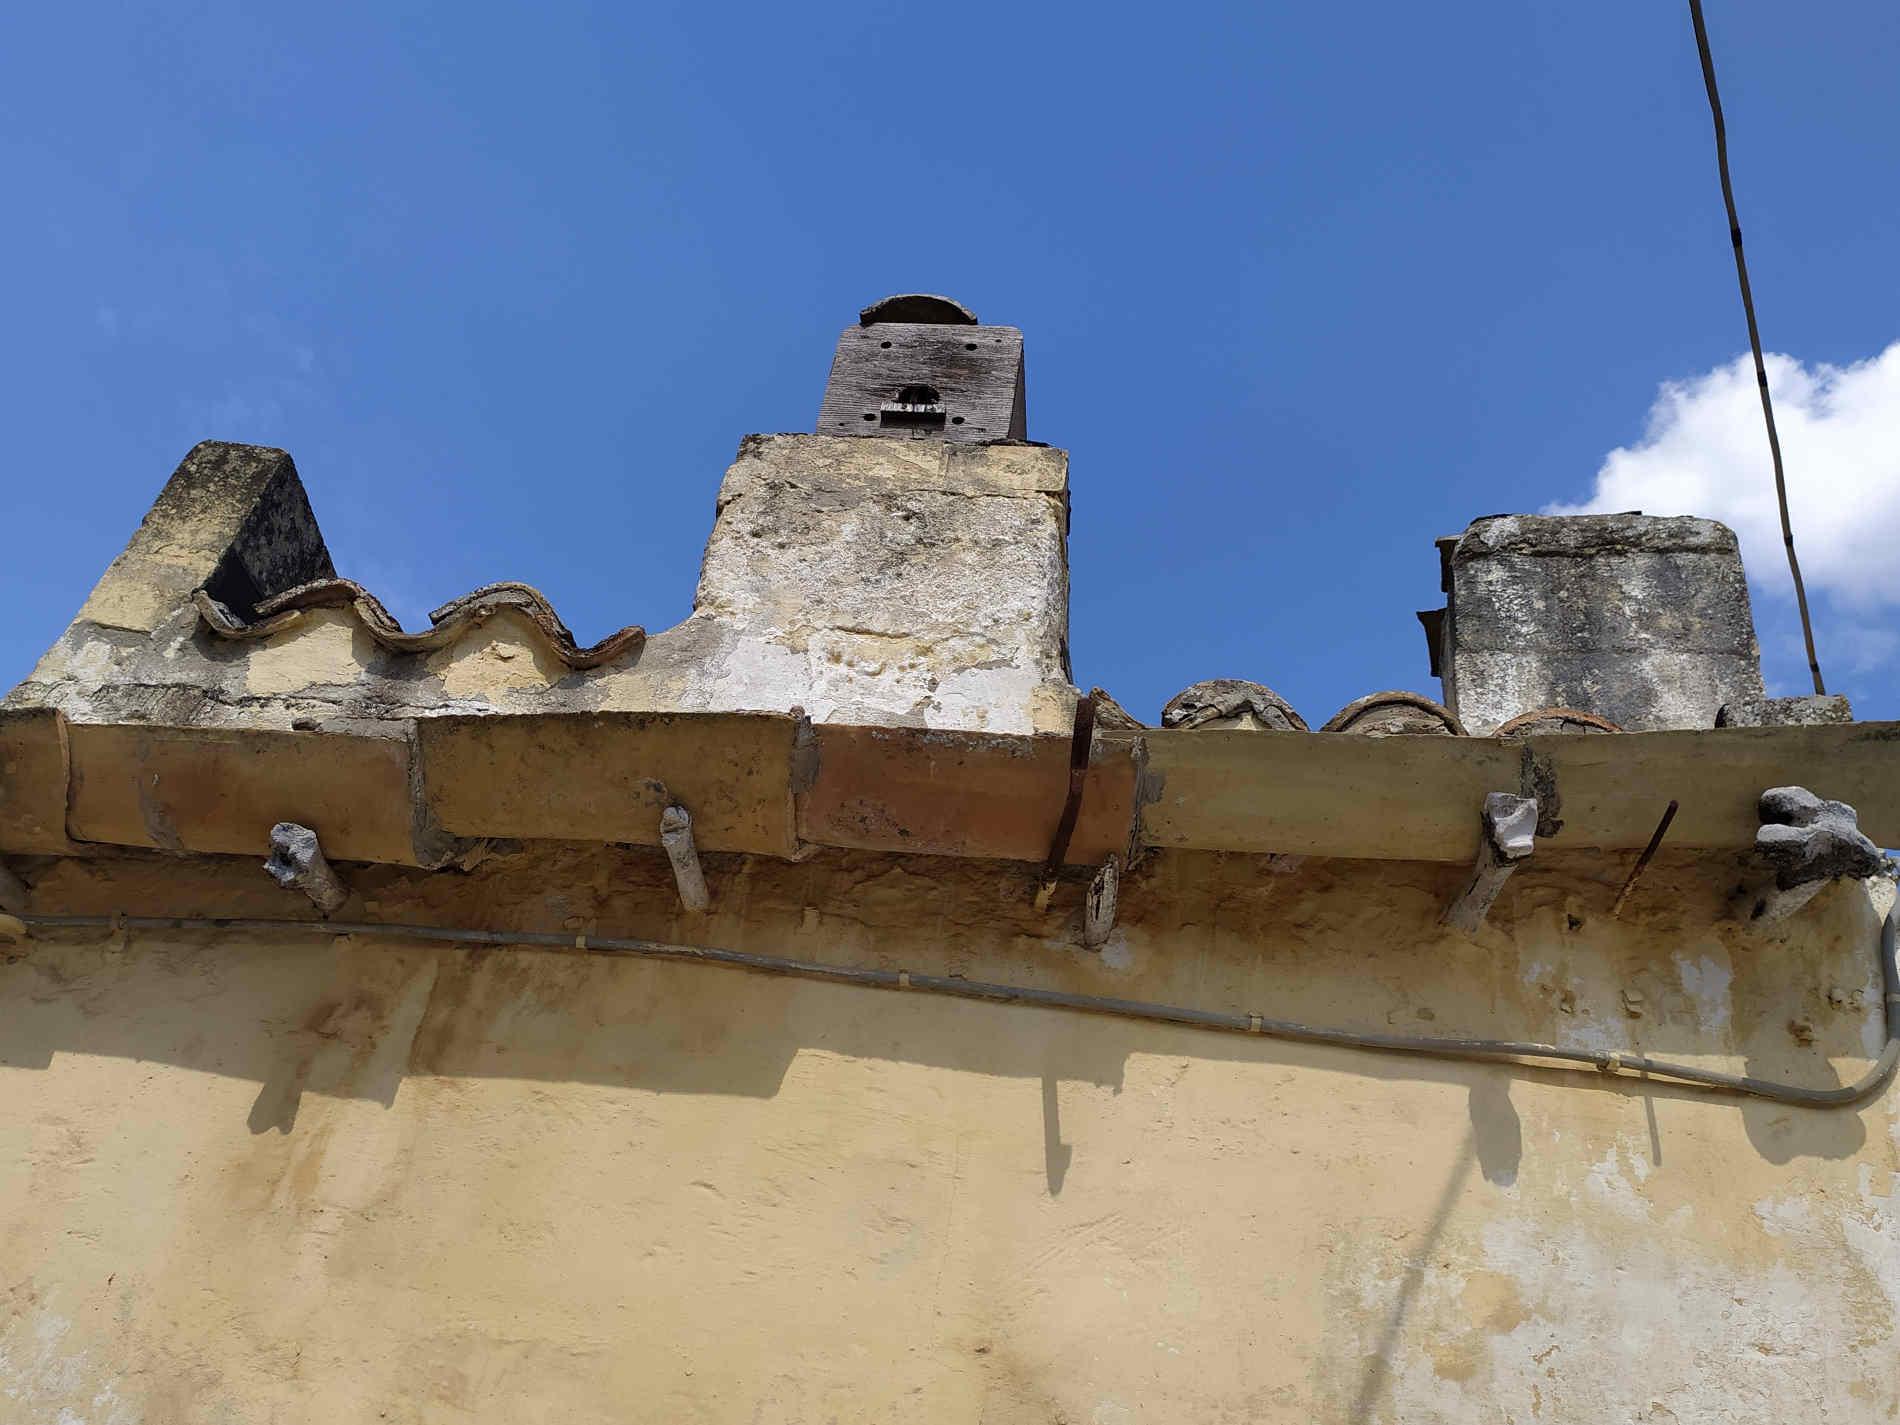 Grondaie sorrette da ossa di animali nei sassi di Matera